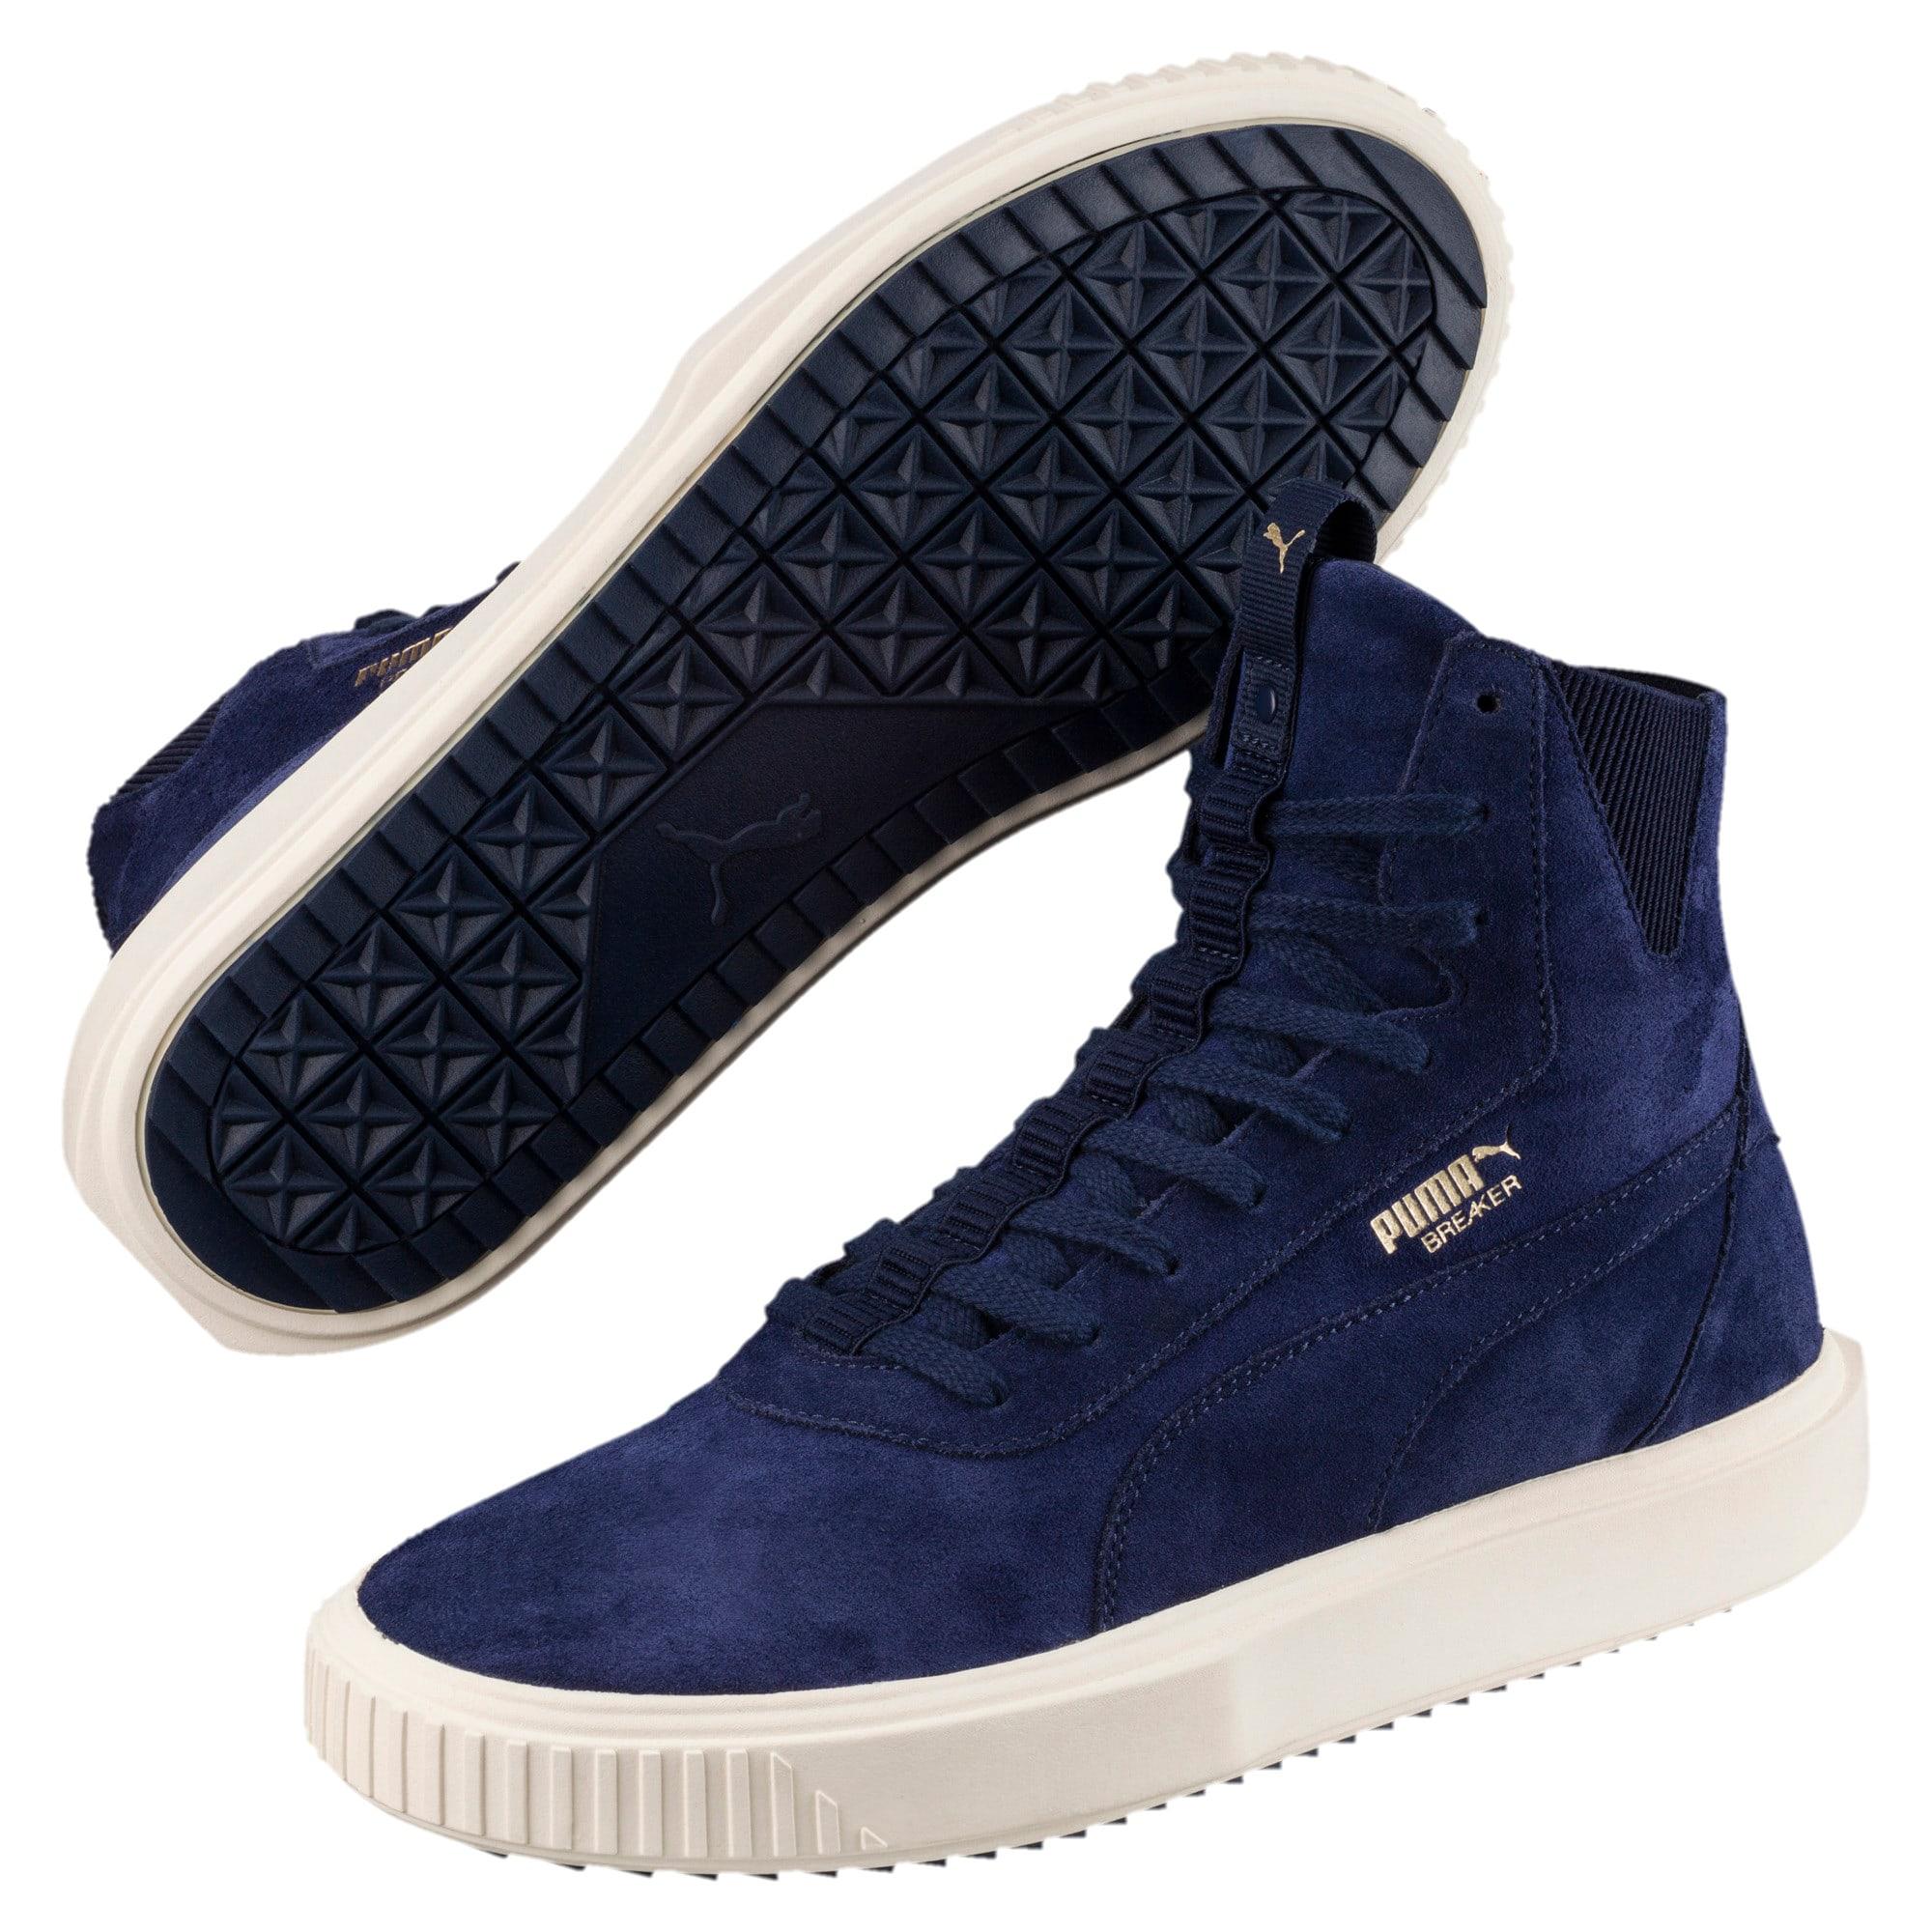 Thumbnail 2 of PUMA Breaker Hi Evolution Sneakers, Peacoat-Whisper White, medium